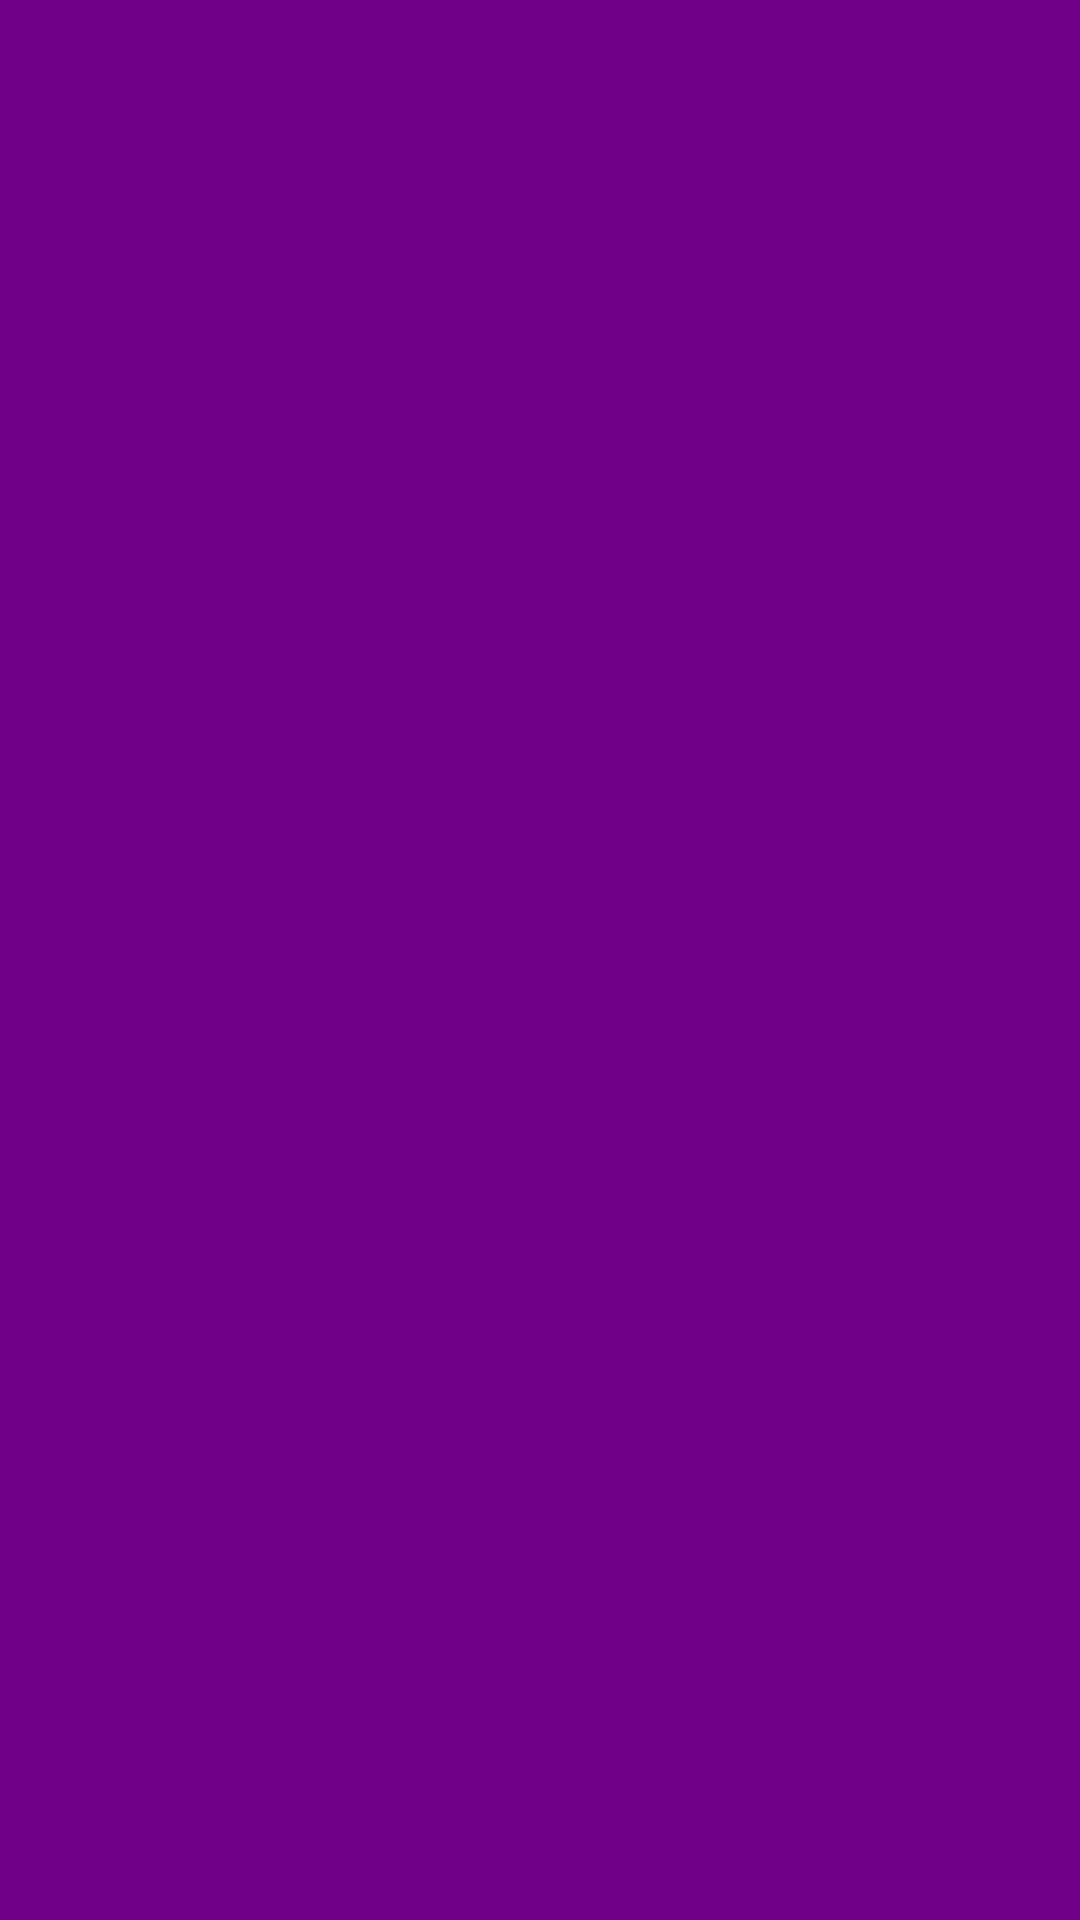 Purple Wallpapers on WallpaperDog